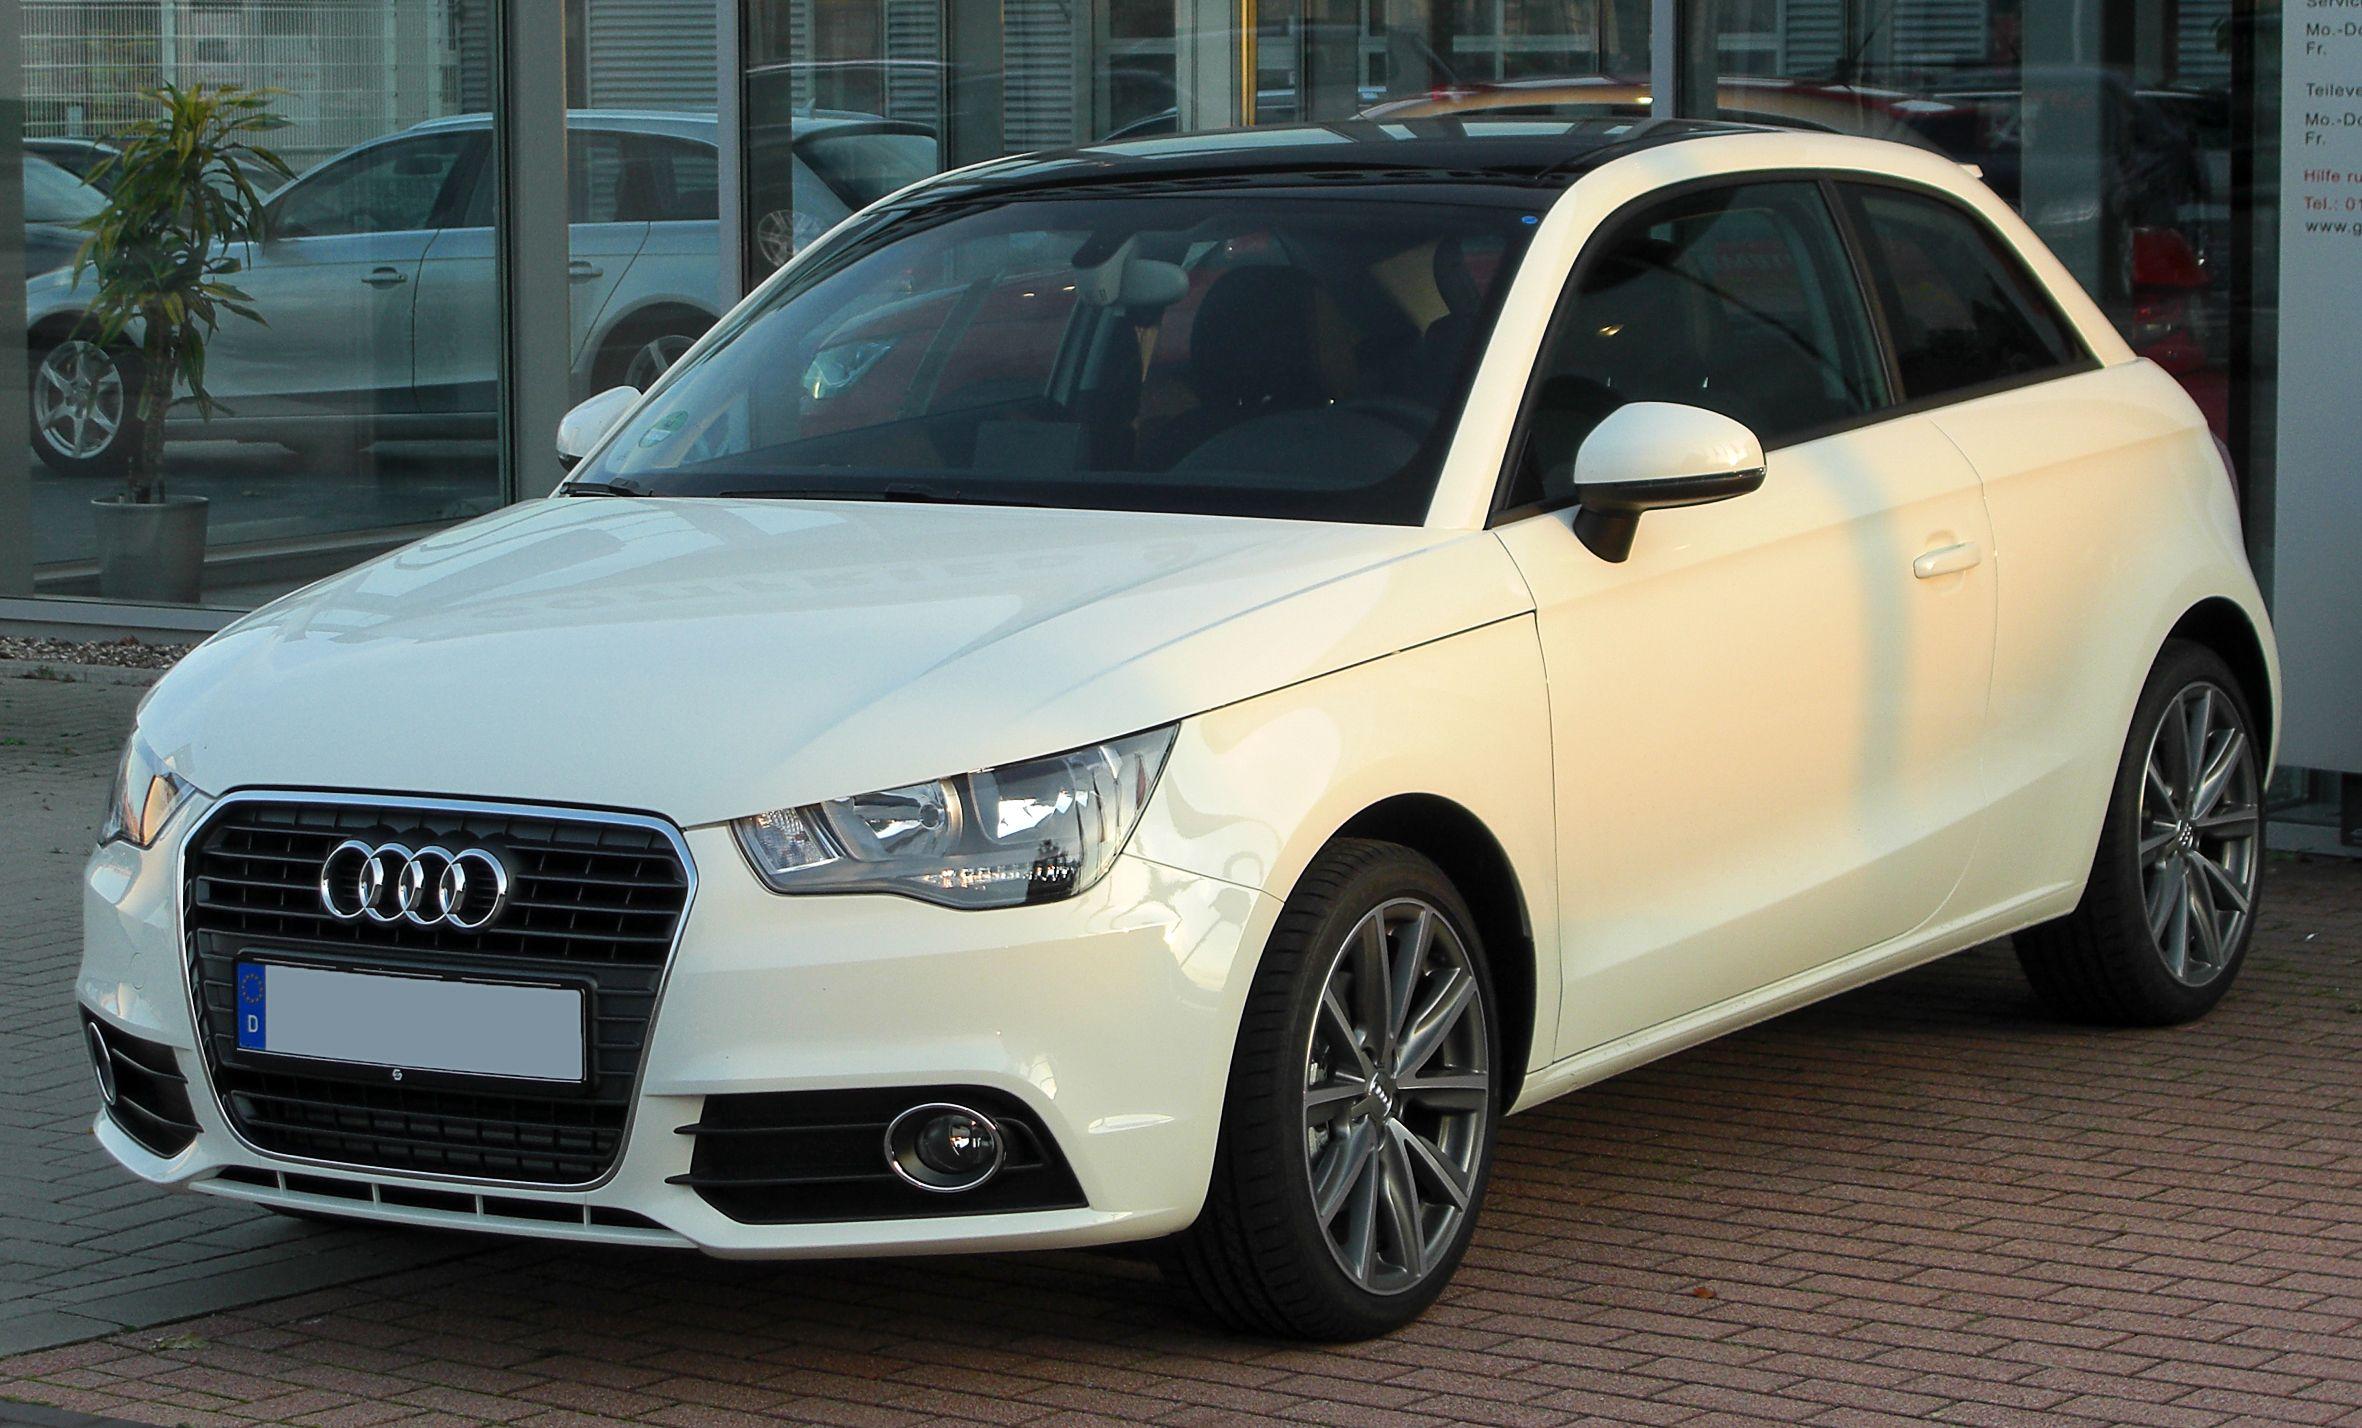 Audi A1 1 6 Tdi Ambition Audi A1 Audi Volkswagen Tdi